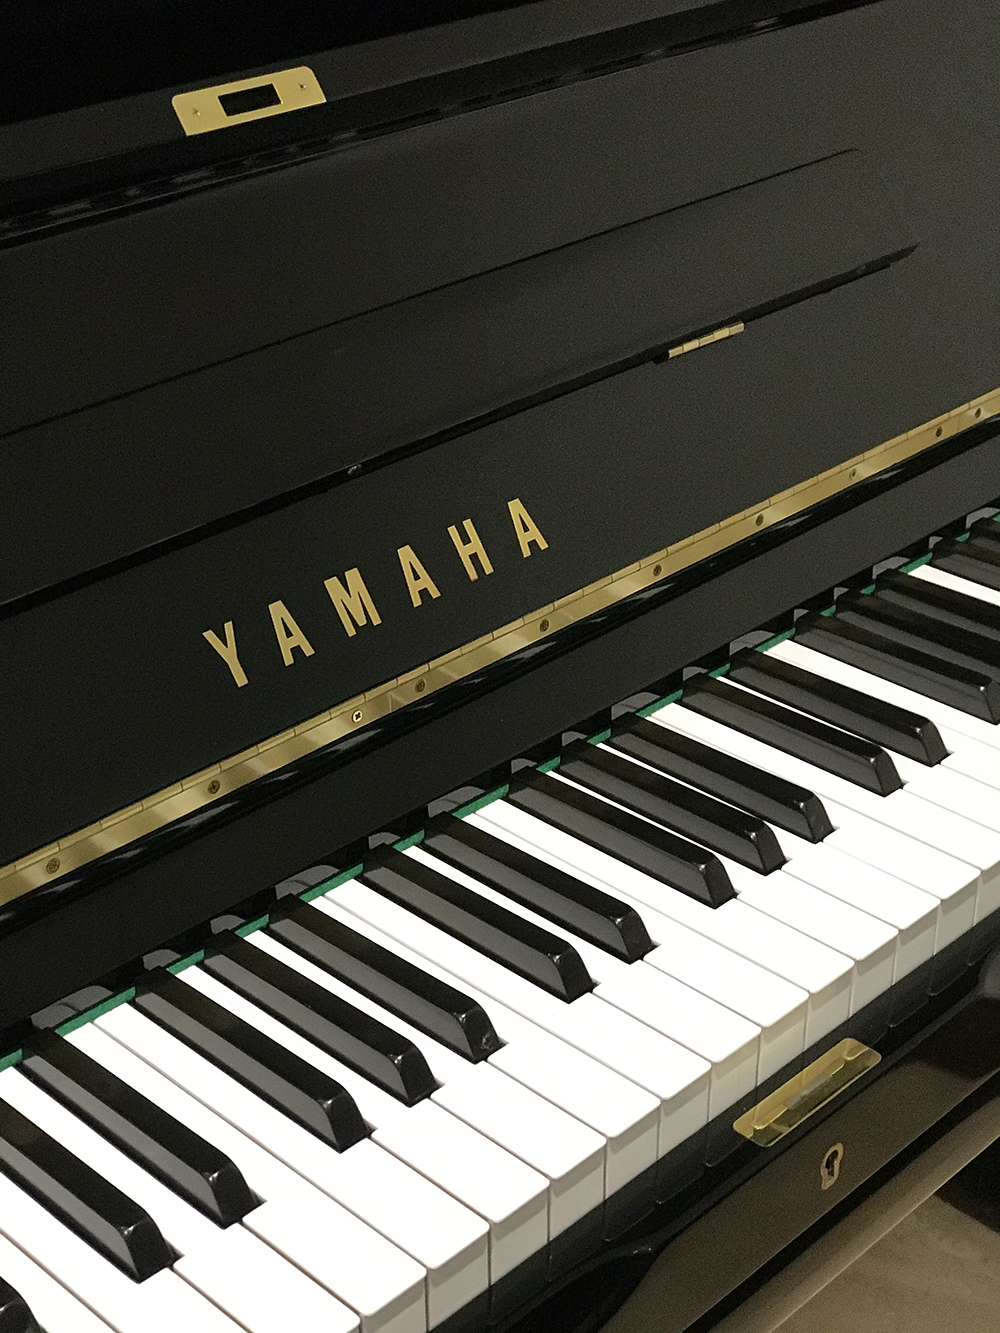 yamaha,piano,u3,used,reconditioned,refurbished,sale,dorset